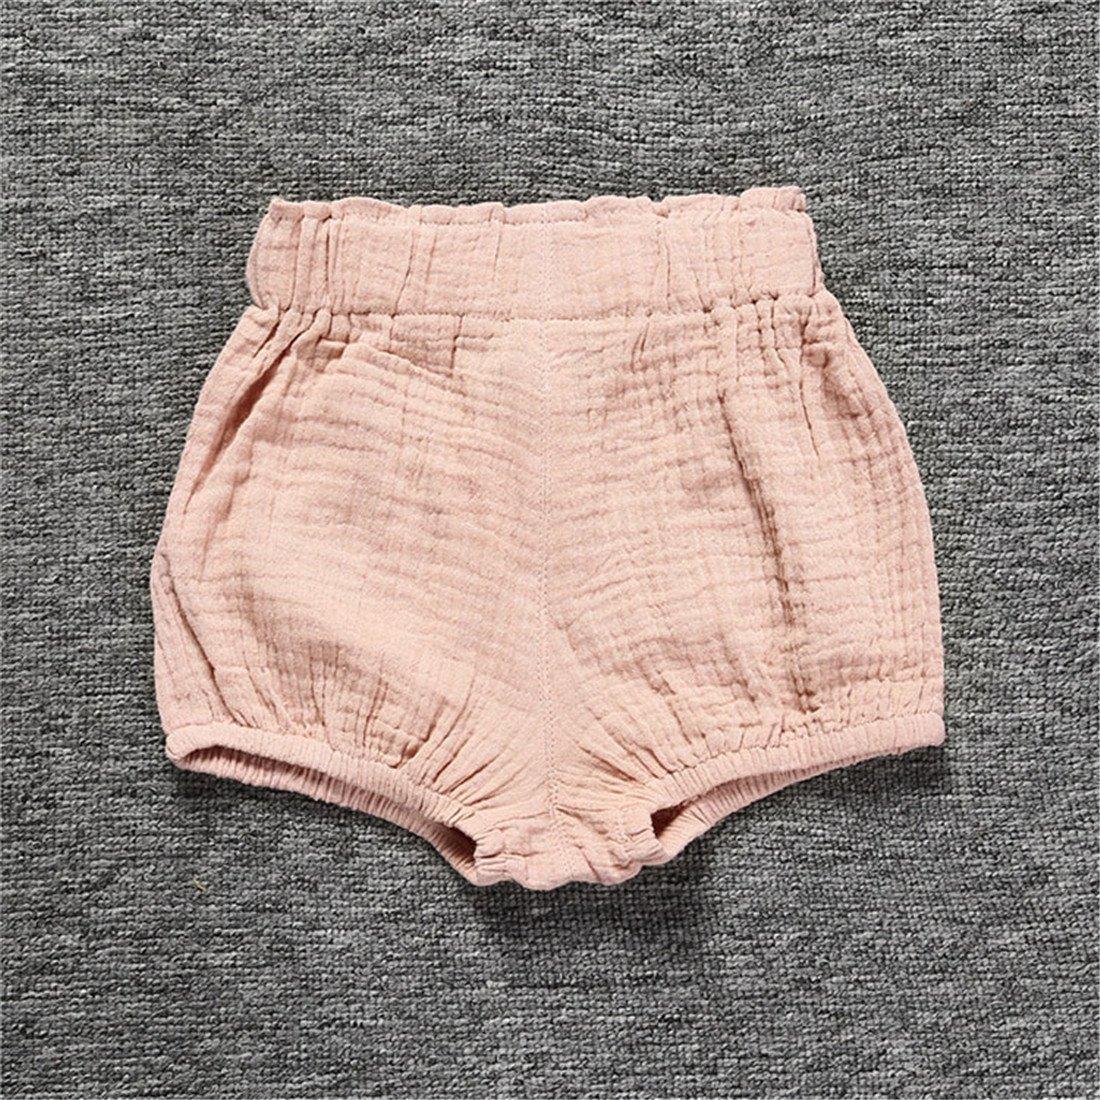 AYIYO Baby Infant Bloomer Shorts Loose Cute Harem Pants for Boys Girls